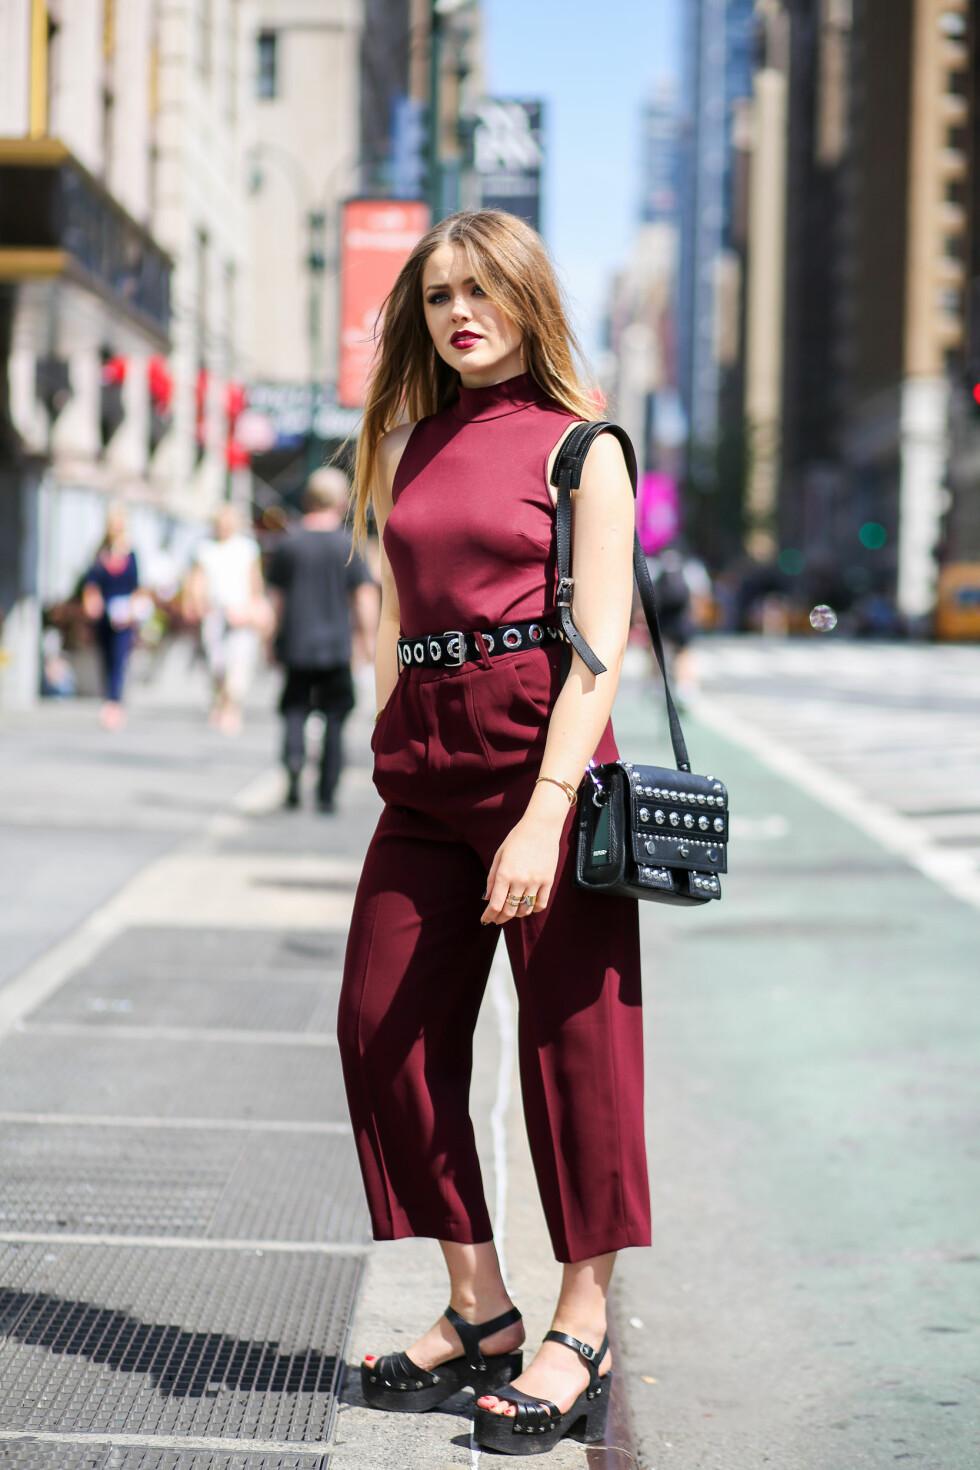 Kristina Bazan Foto: Abaca